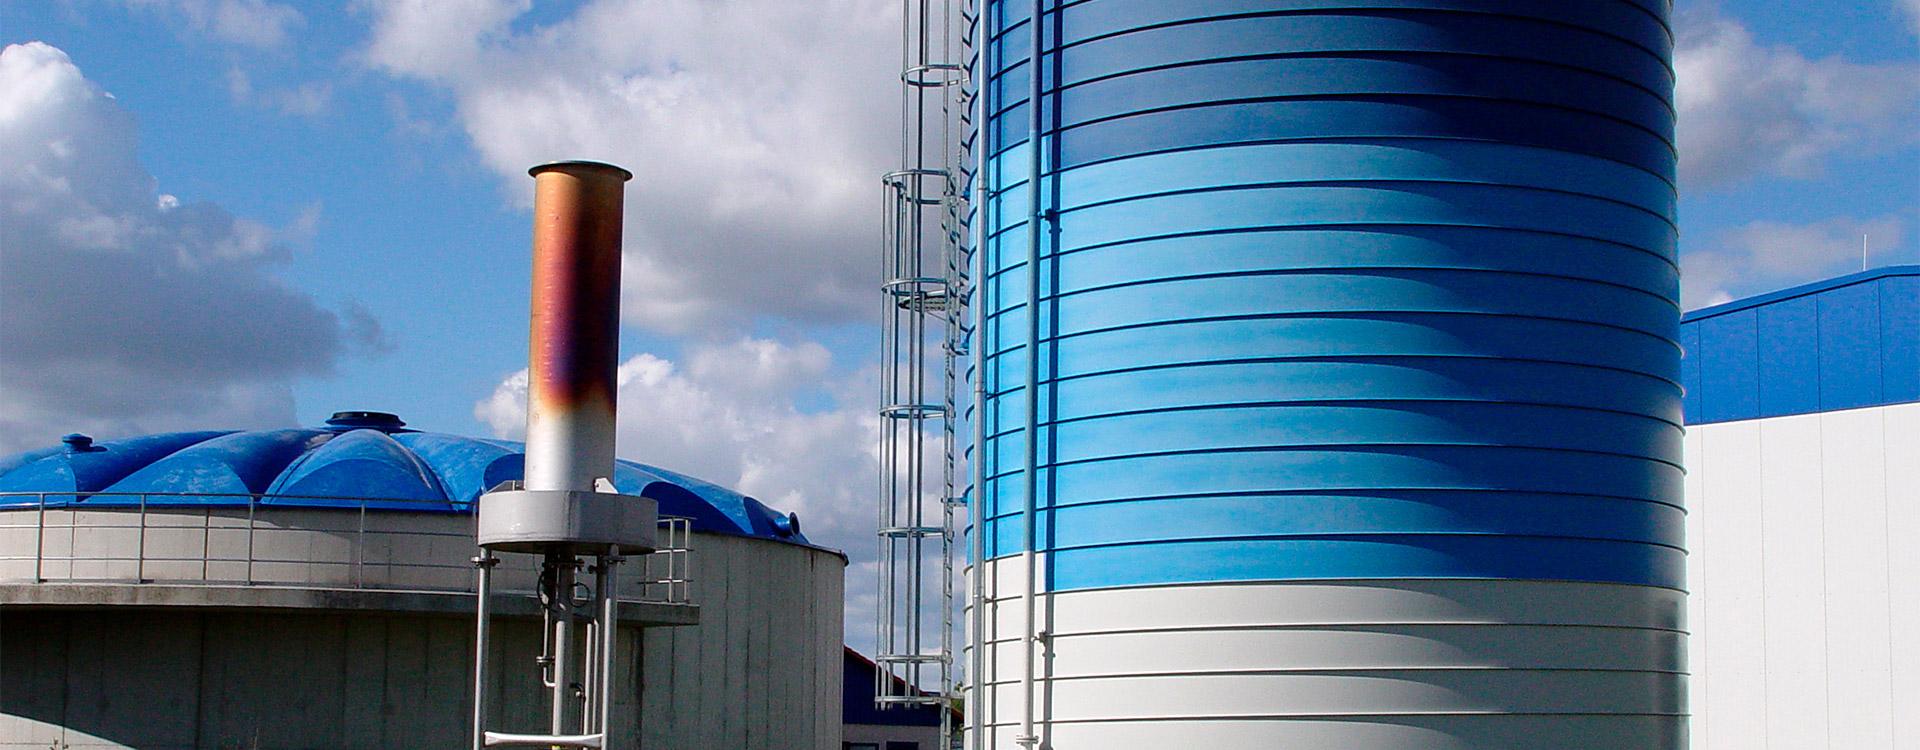 Kommunen Gasspeicherung - Lipp System